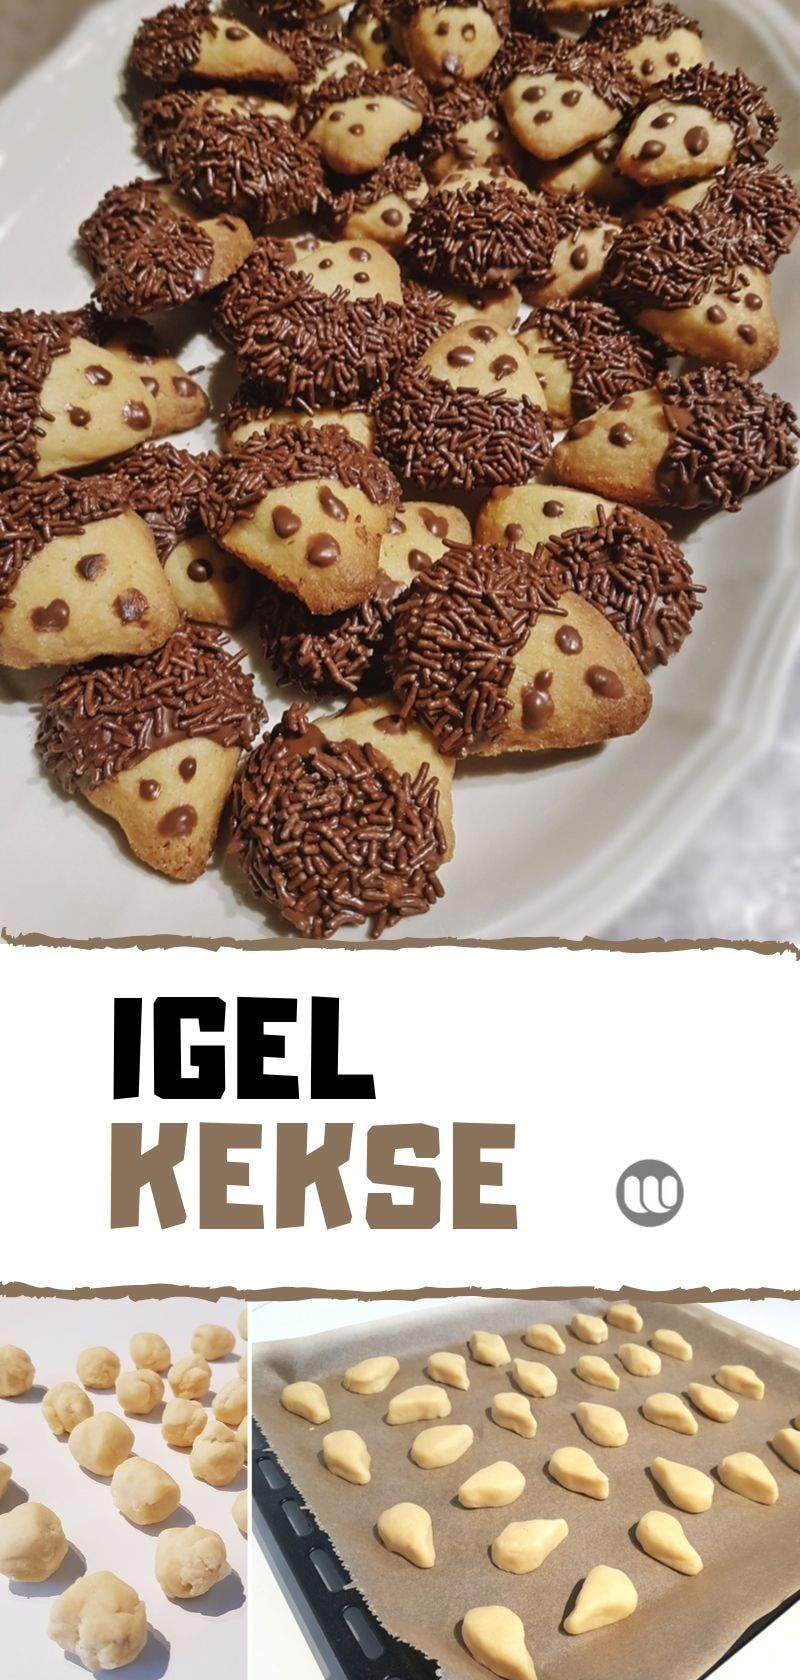 Rezept: Igel-Kekse aus 1-2-3 Mürbeteig backen im Herbst